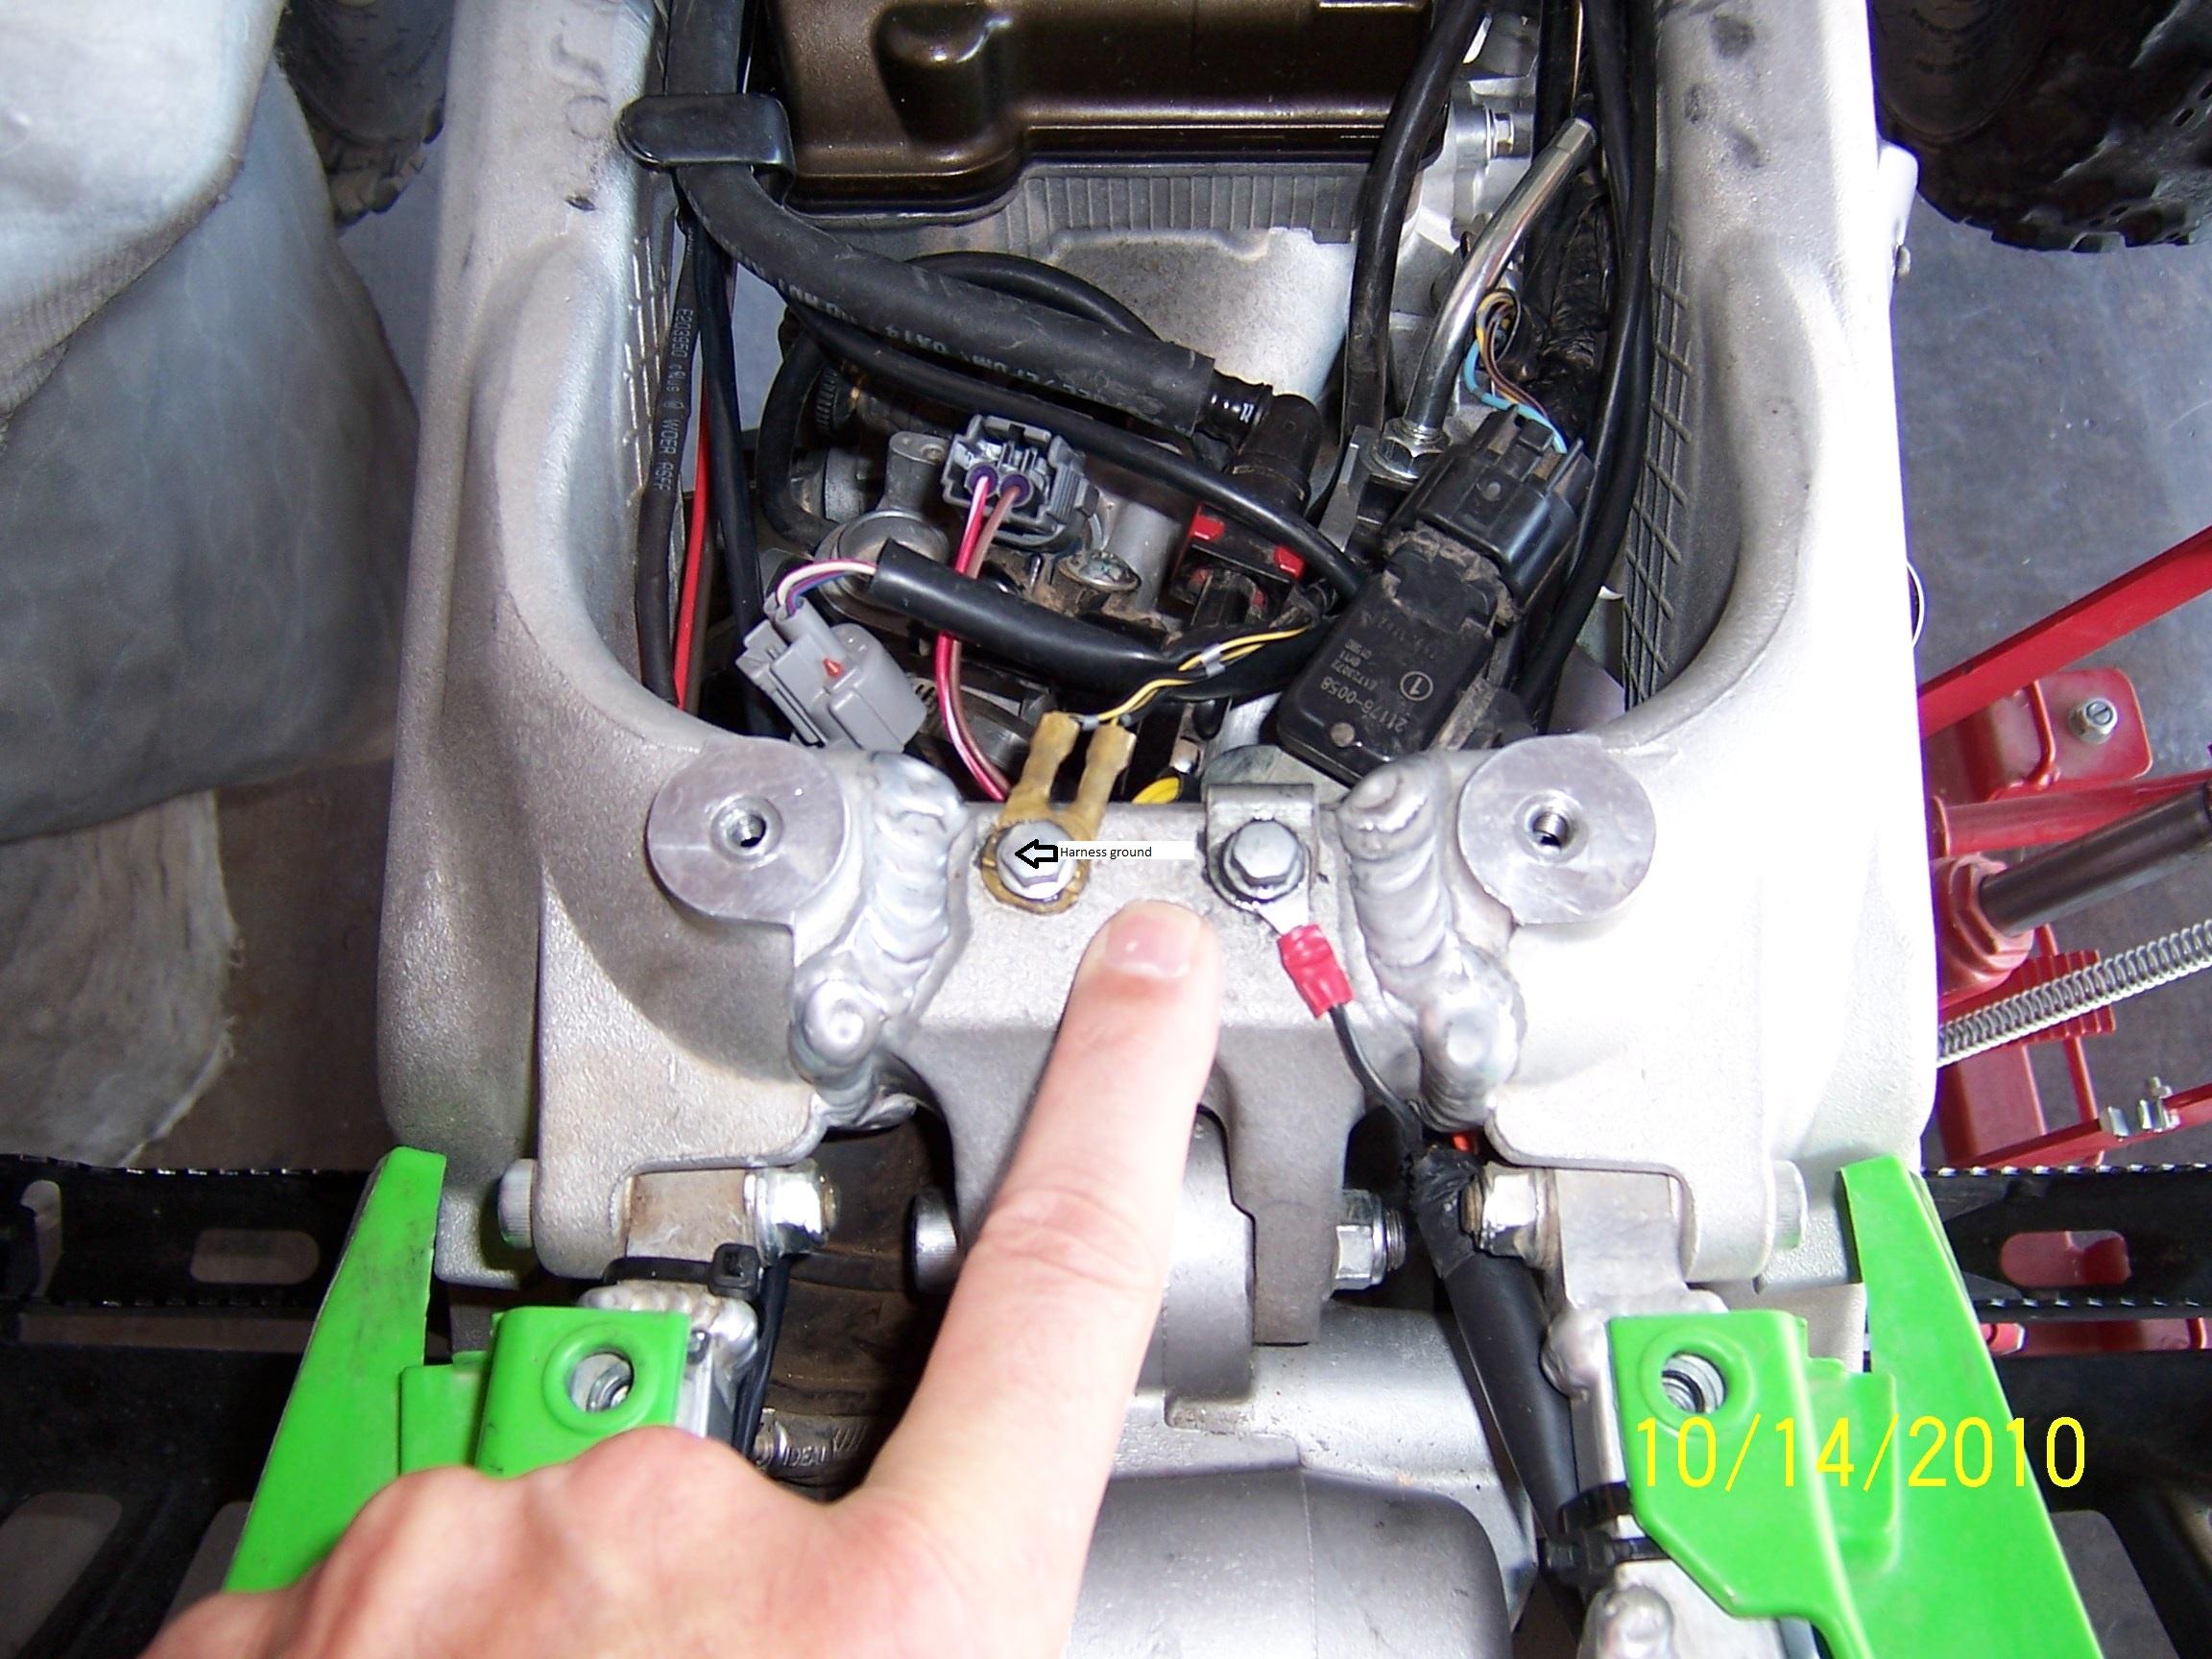 Kfx 450r Wiring Diagram